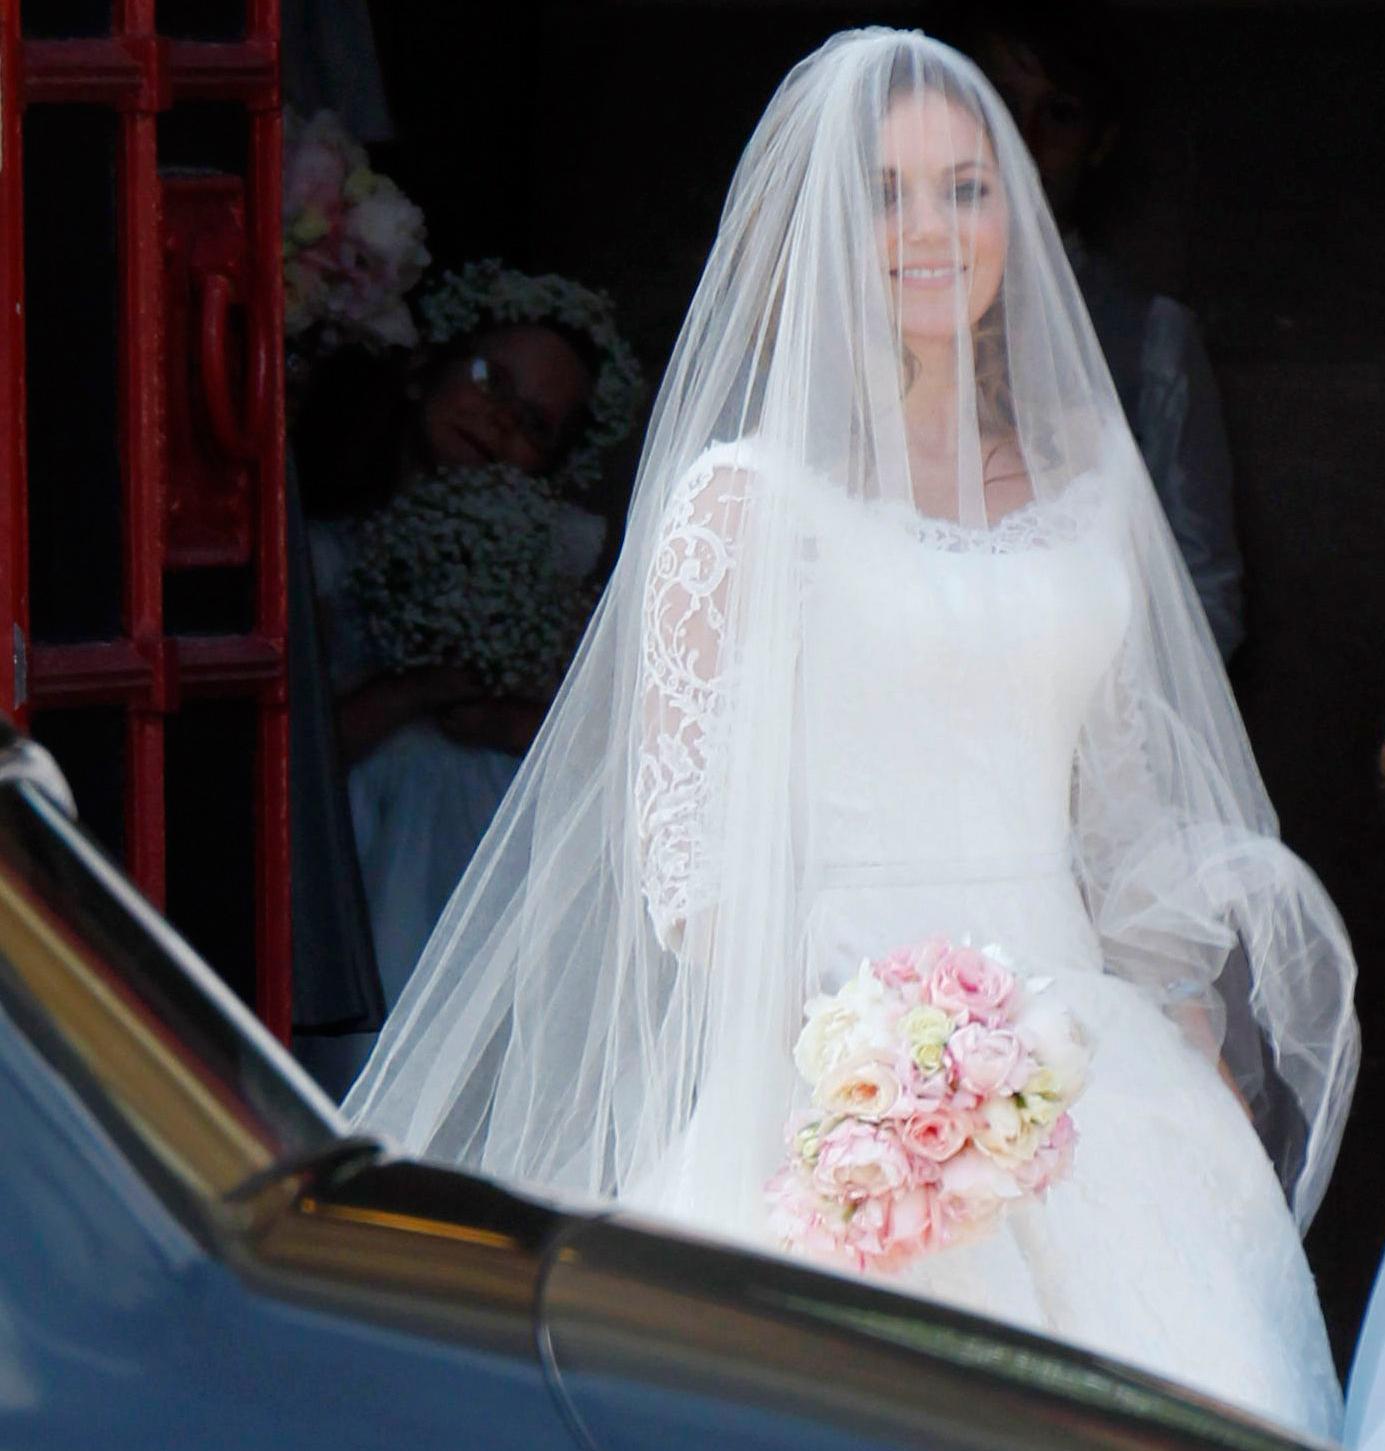 fashion celebrity news geri halliwell just married wedding dress photos